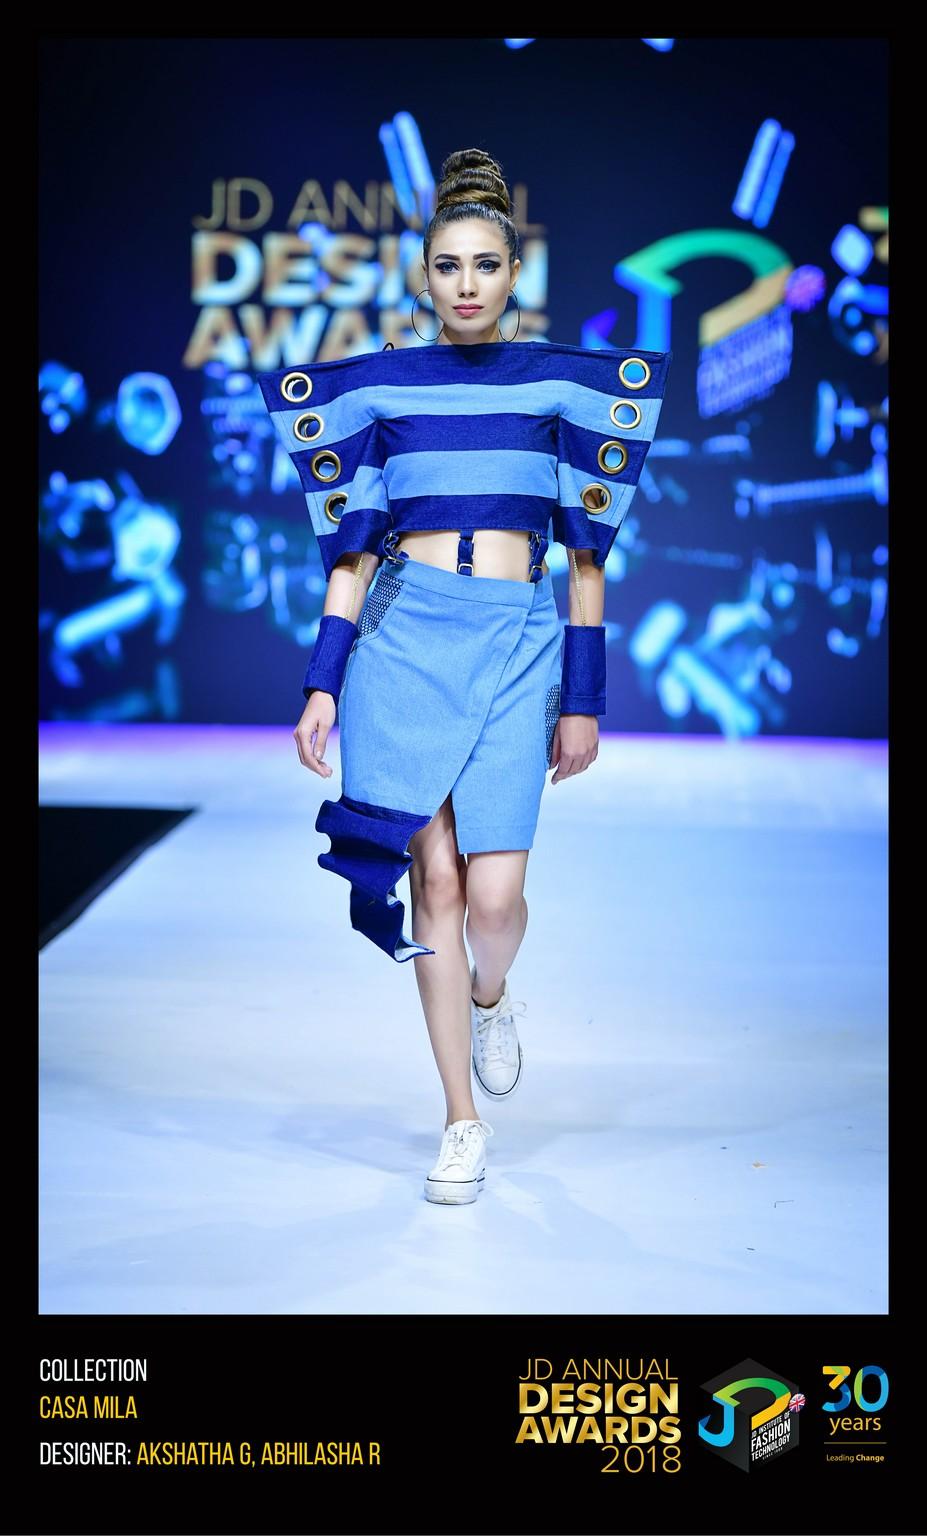 Casa Mila – Change – JD Annual Design Awards 2018 | Designer: Akshata, Sapna and Abhilasha | Photography : Jerin Nath (@jerin_nath) casa mila – change – jd annual design awards 2018 Casa Mila – Change – JD Annual Design Awards 2018 CASA MILA 7